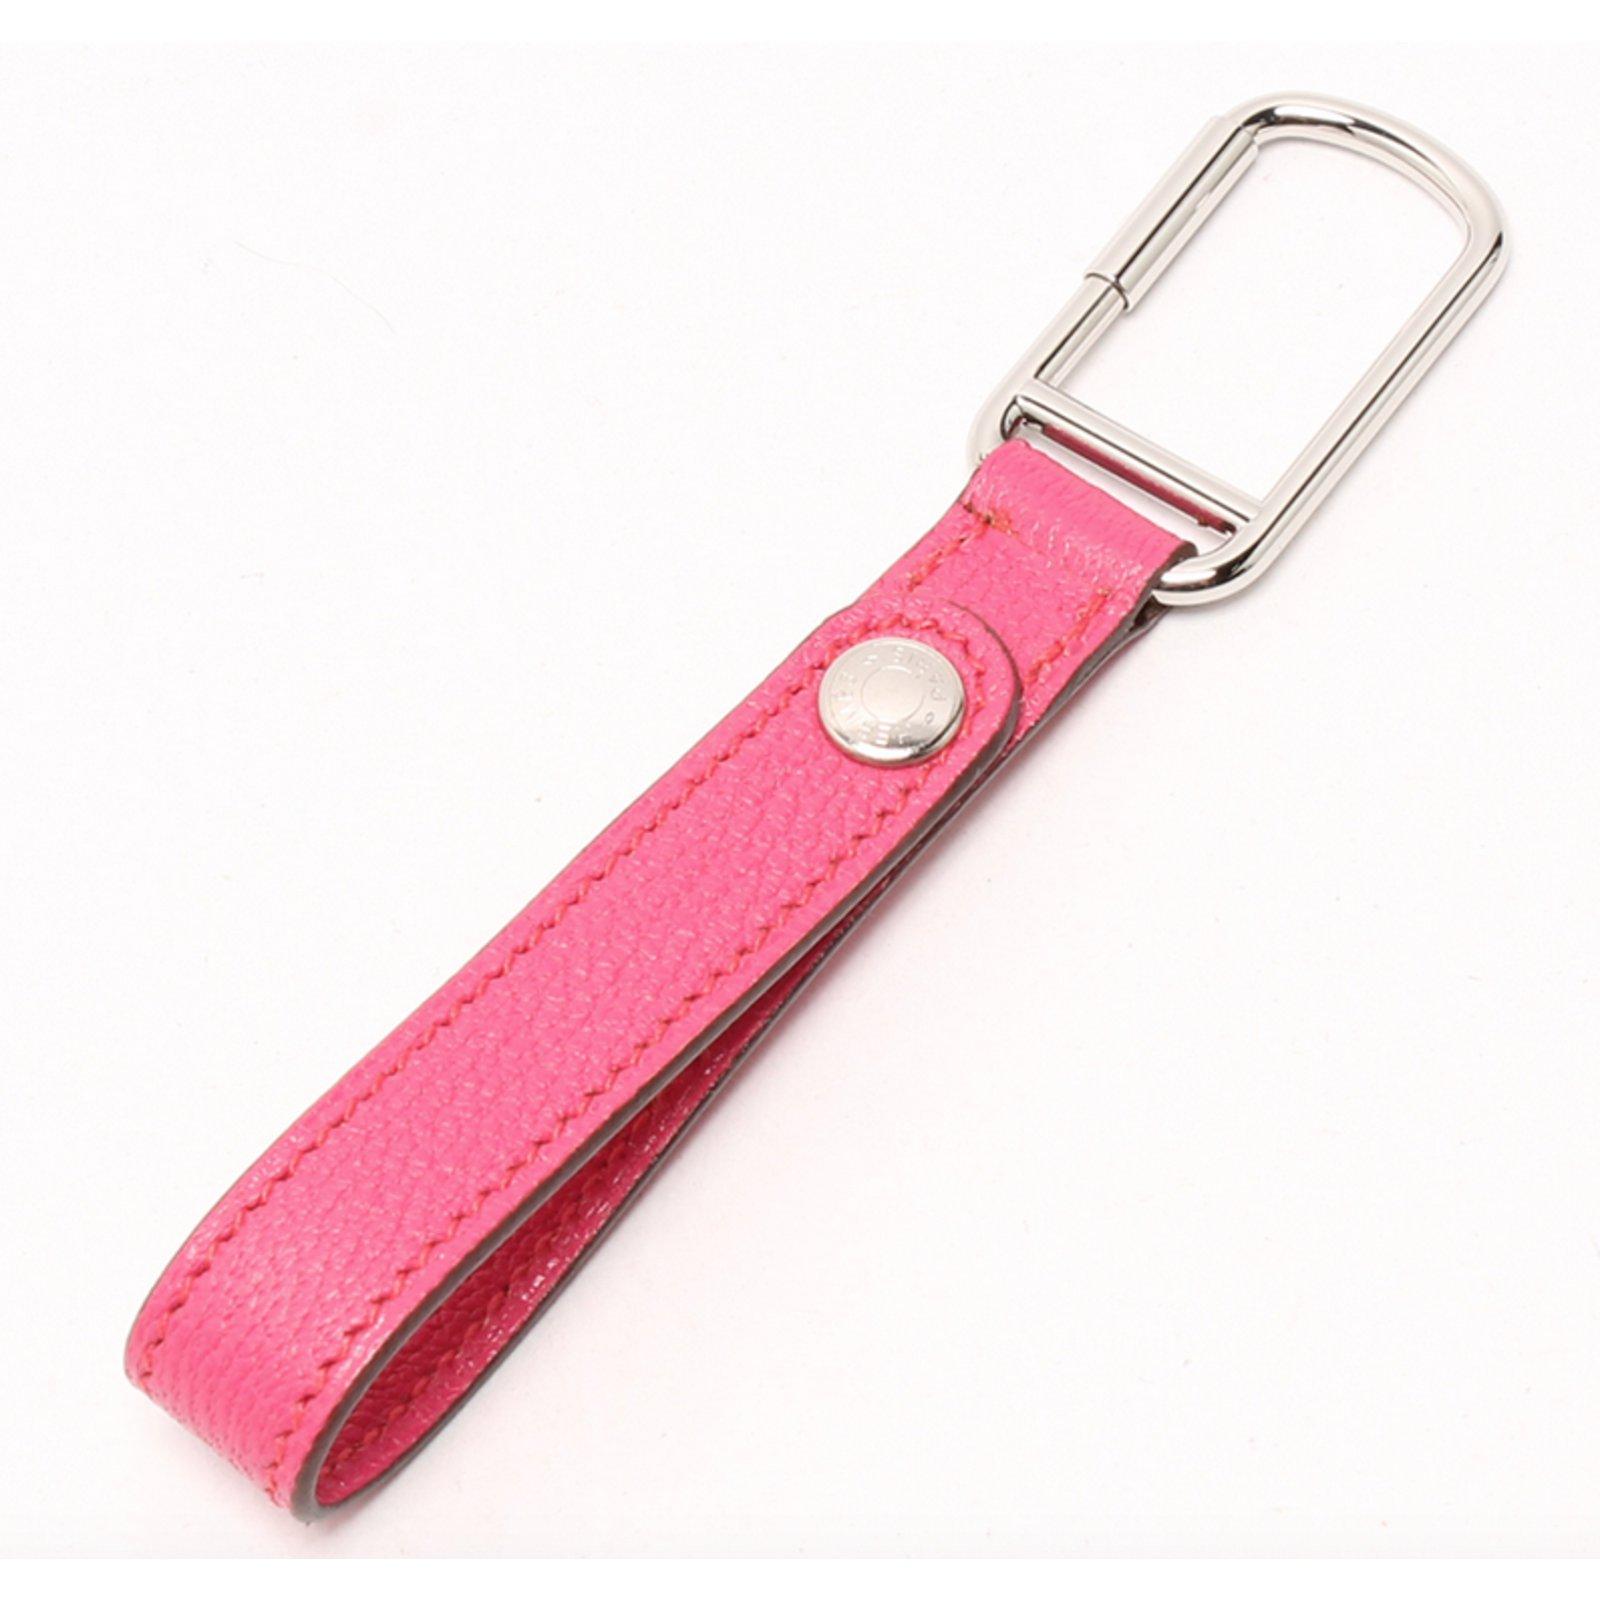 91b202b8cc Petite maroquinerie Hermès Porte clés bijou de sac Cuir Rose ref.42292